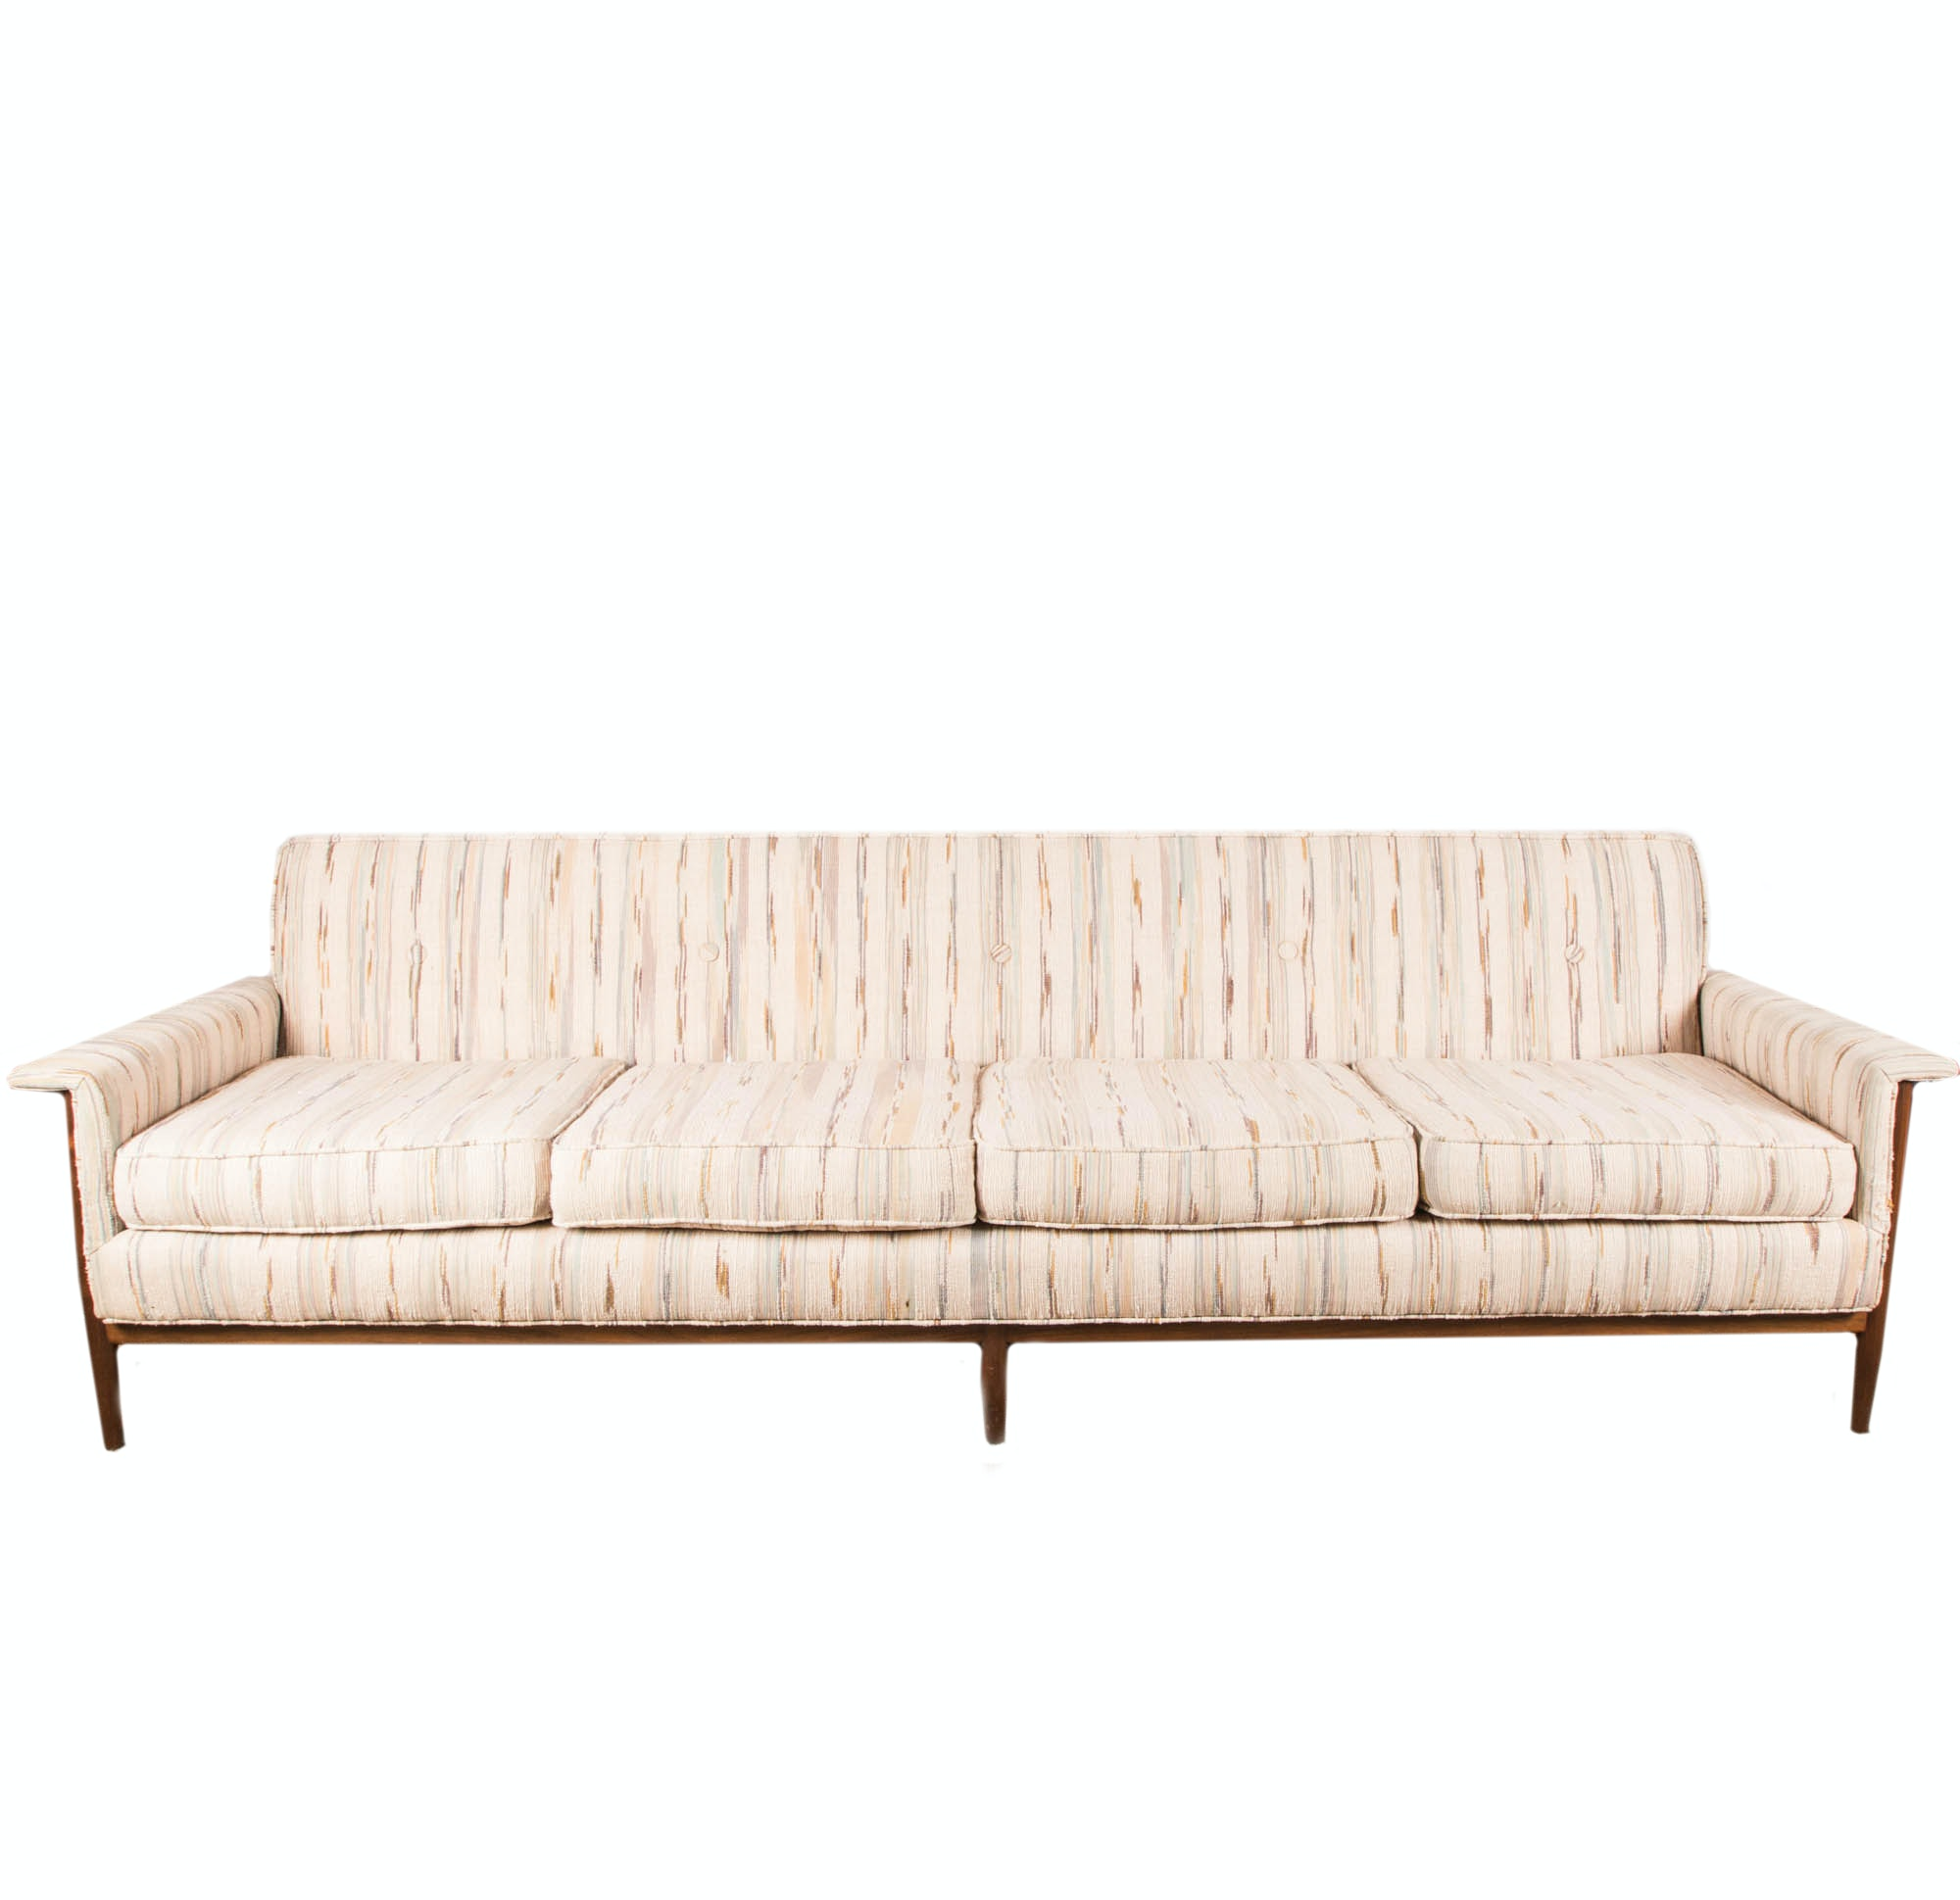 Walnut Mid Century Modern Sofa